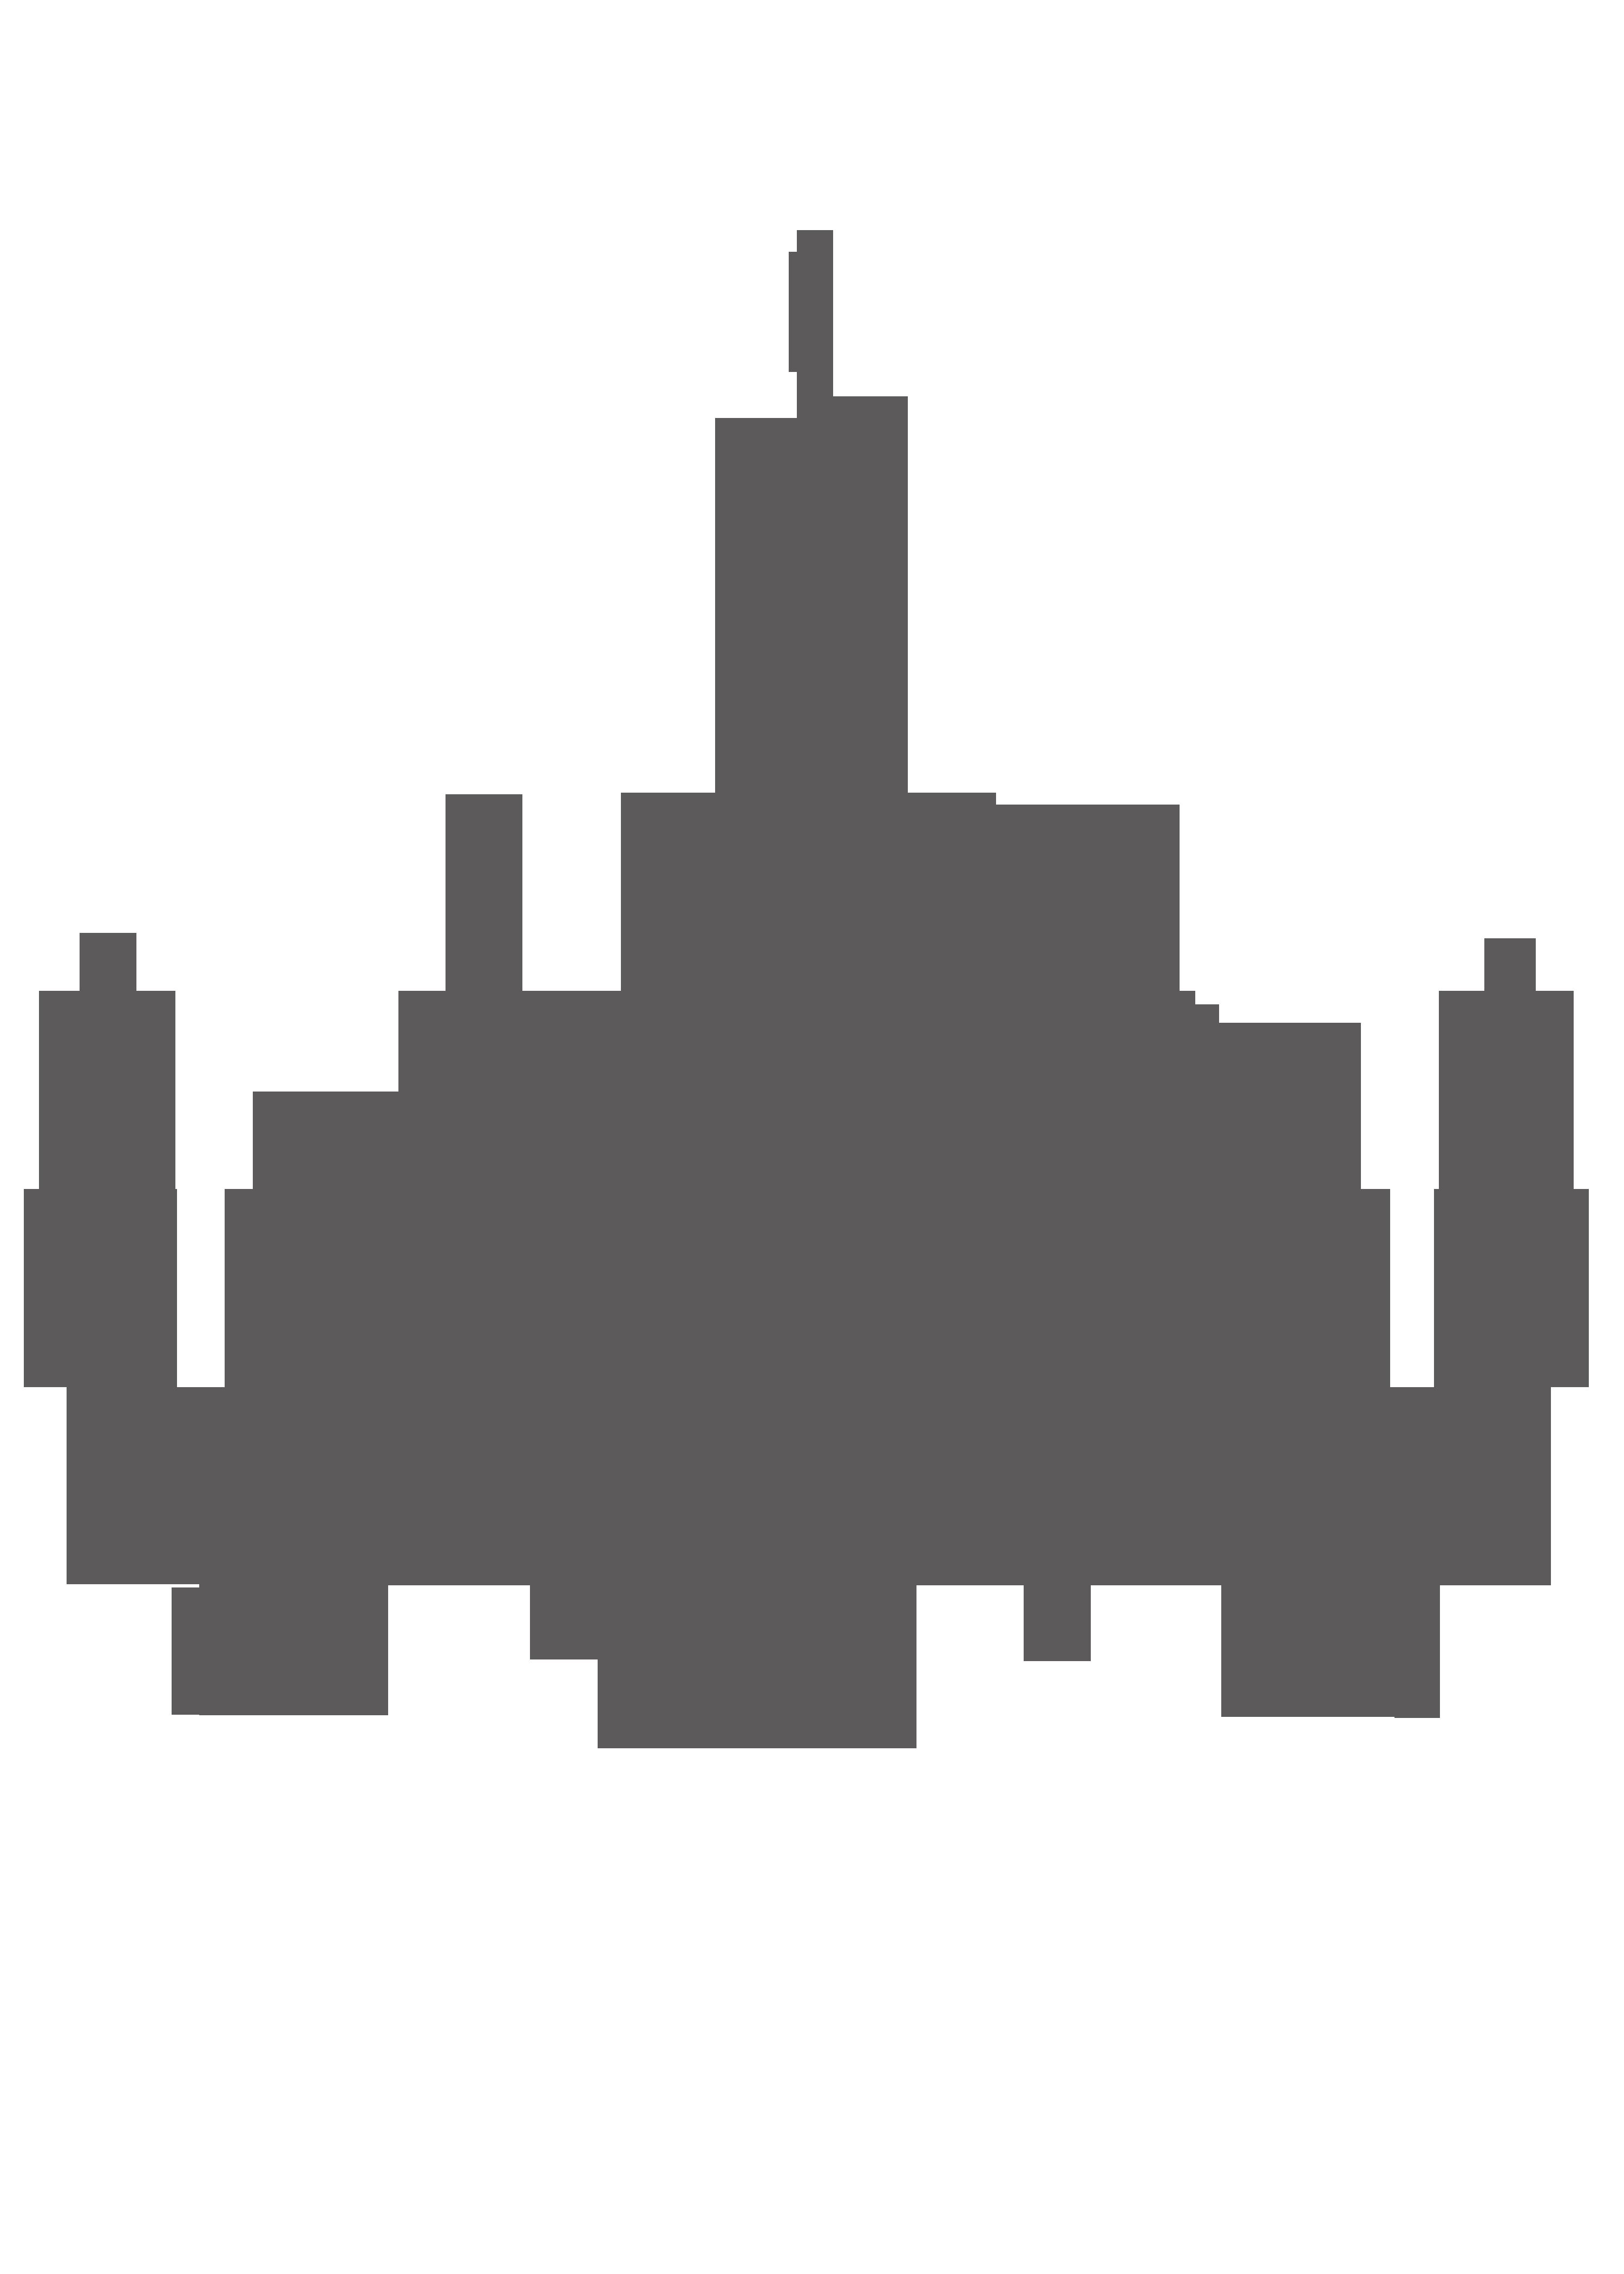 Halloween chandelier clipart clip art Chandelier Template- for Brooke & Lola's dresser | crafts ... clip art